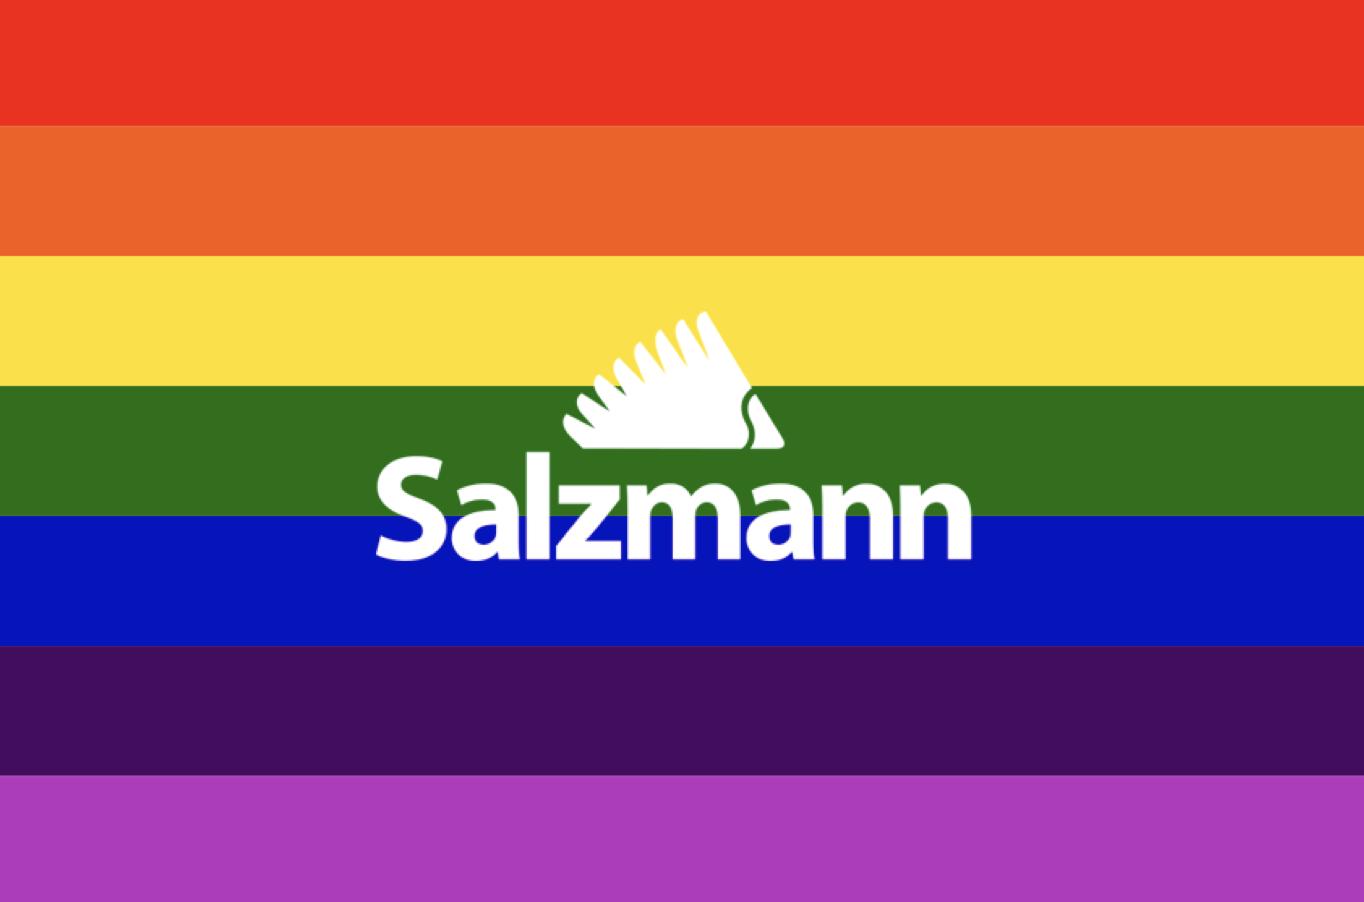 pride high visibility salzmann